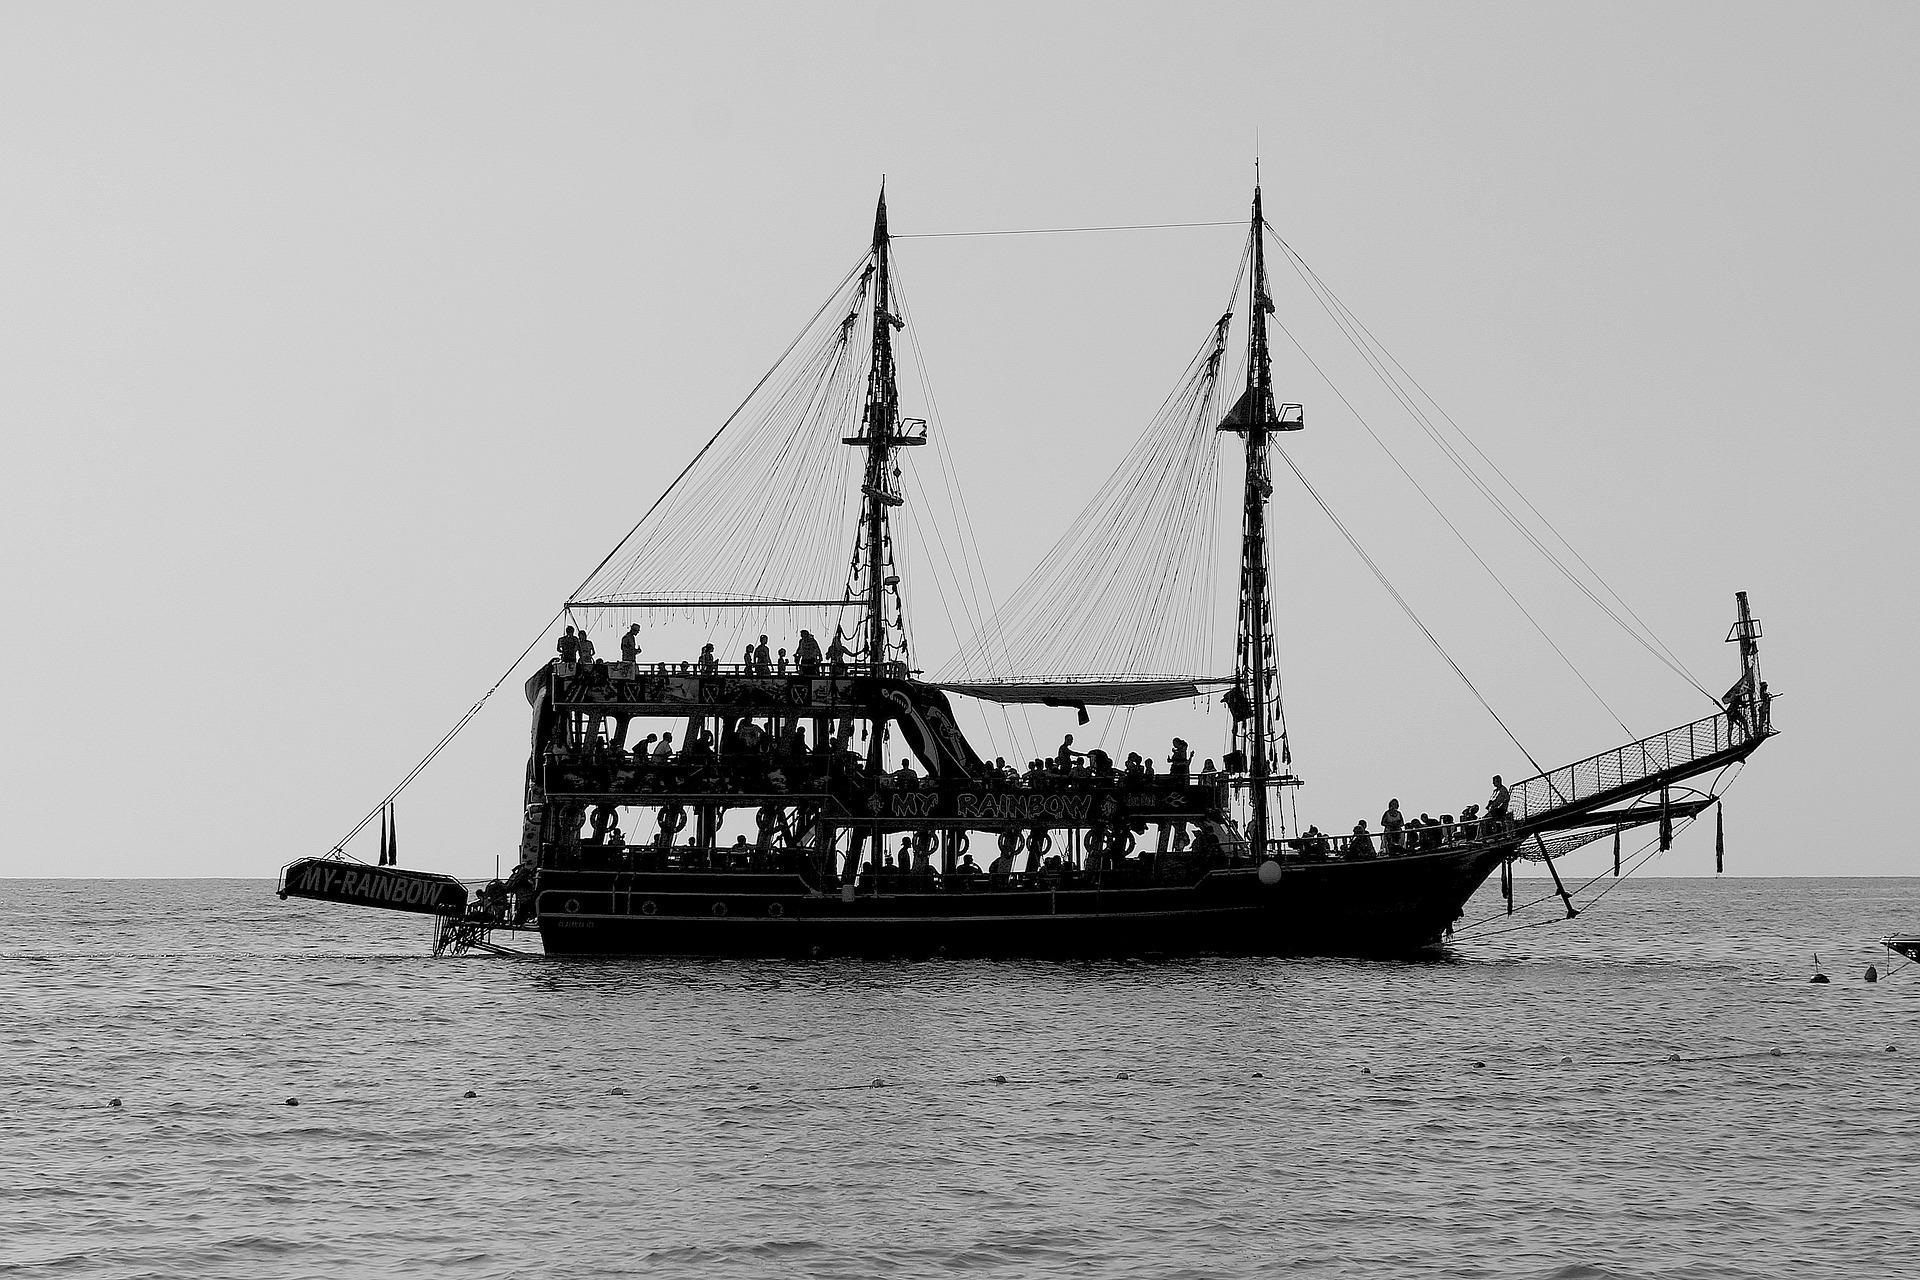 ship-jonah-journey-wes_schaeffer_from_todays_reading